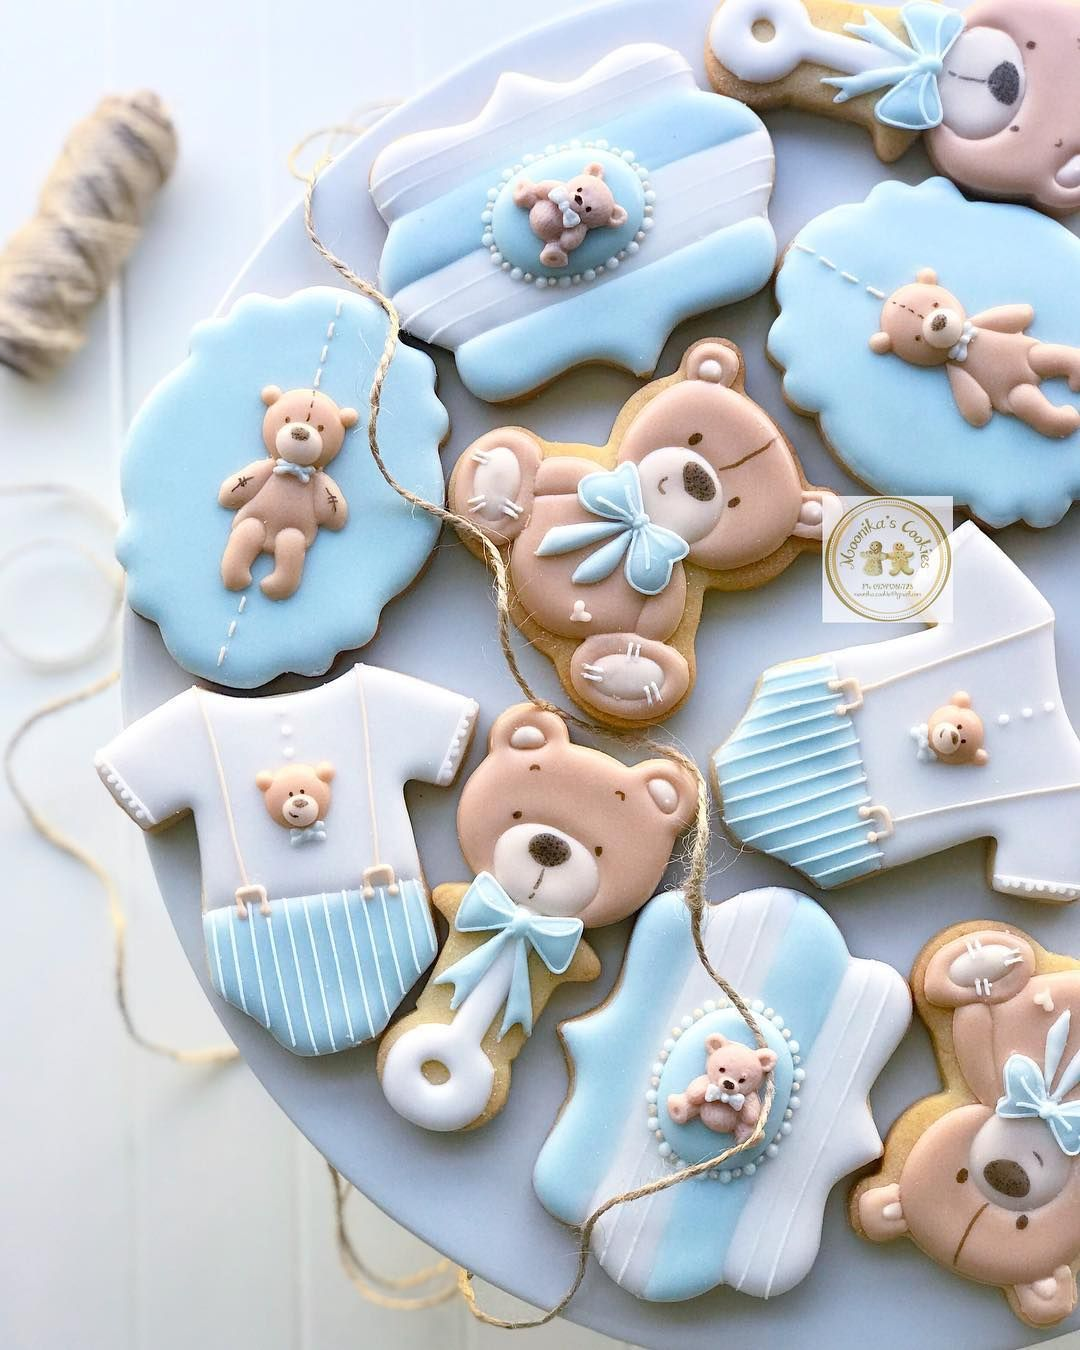 1 942 Likes 54 Comments Moonika S Cookies Moonikas Cookies